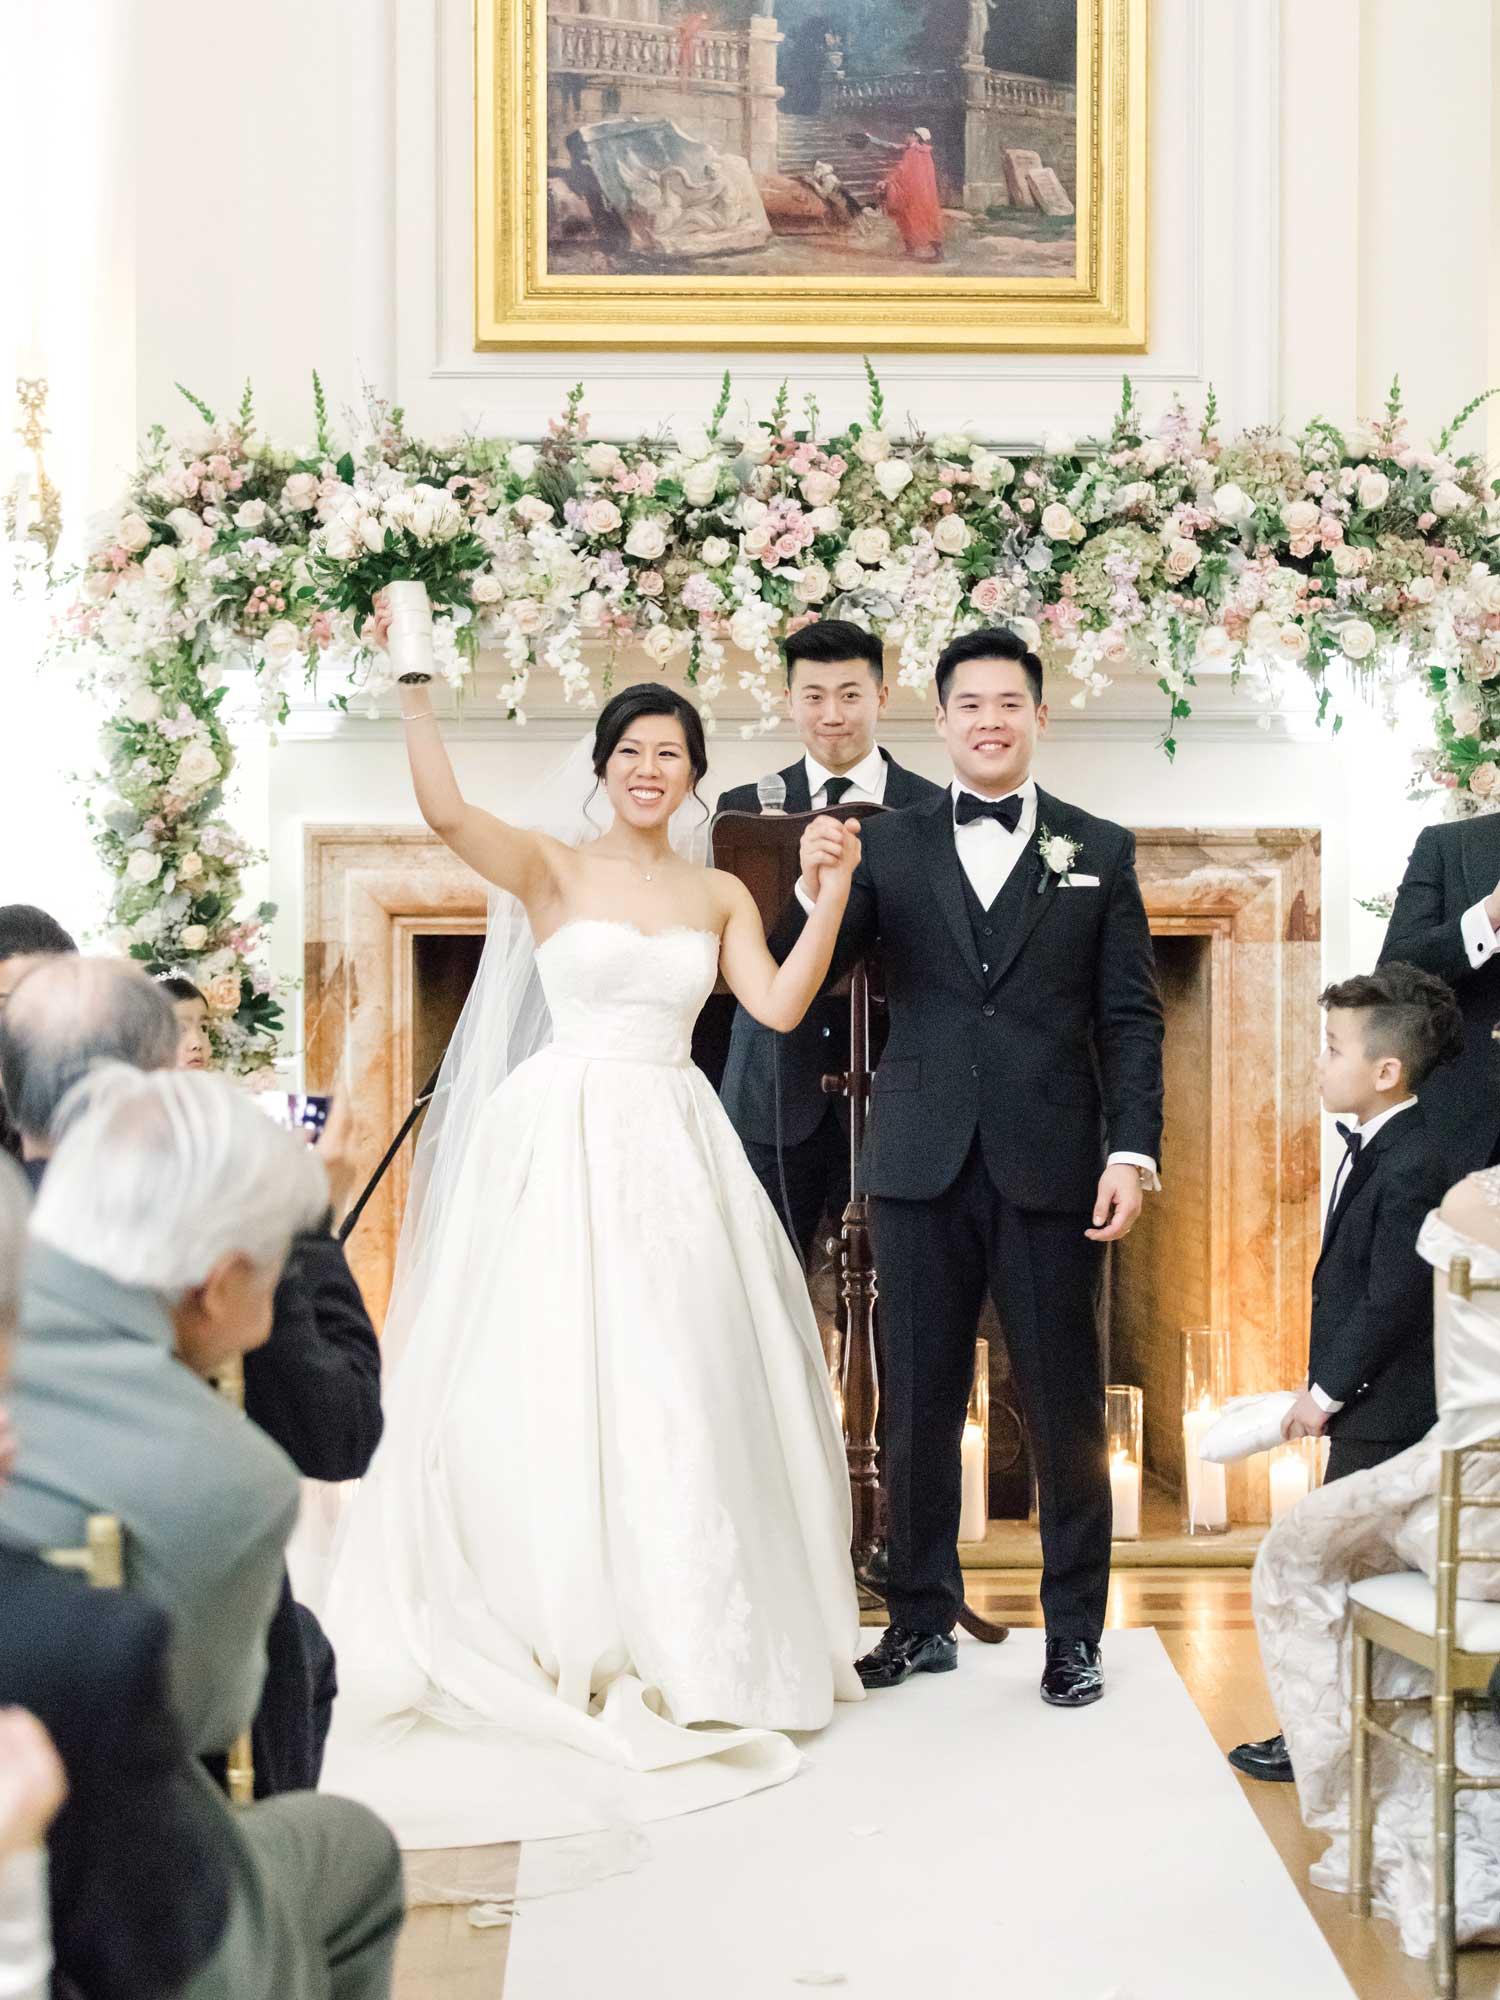 inside weddings winter 2019 issue preview oheka castle wedding ceremony aisle runner